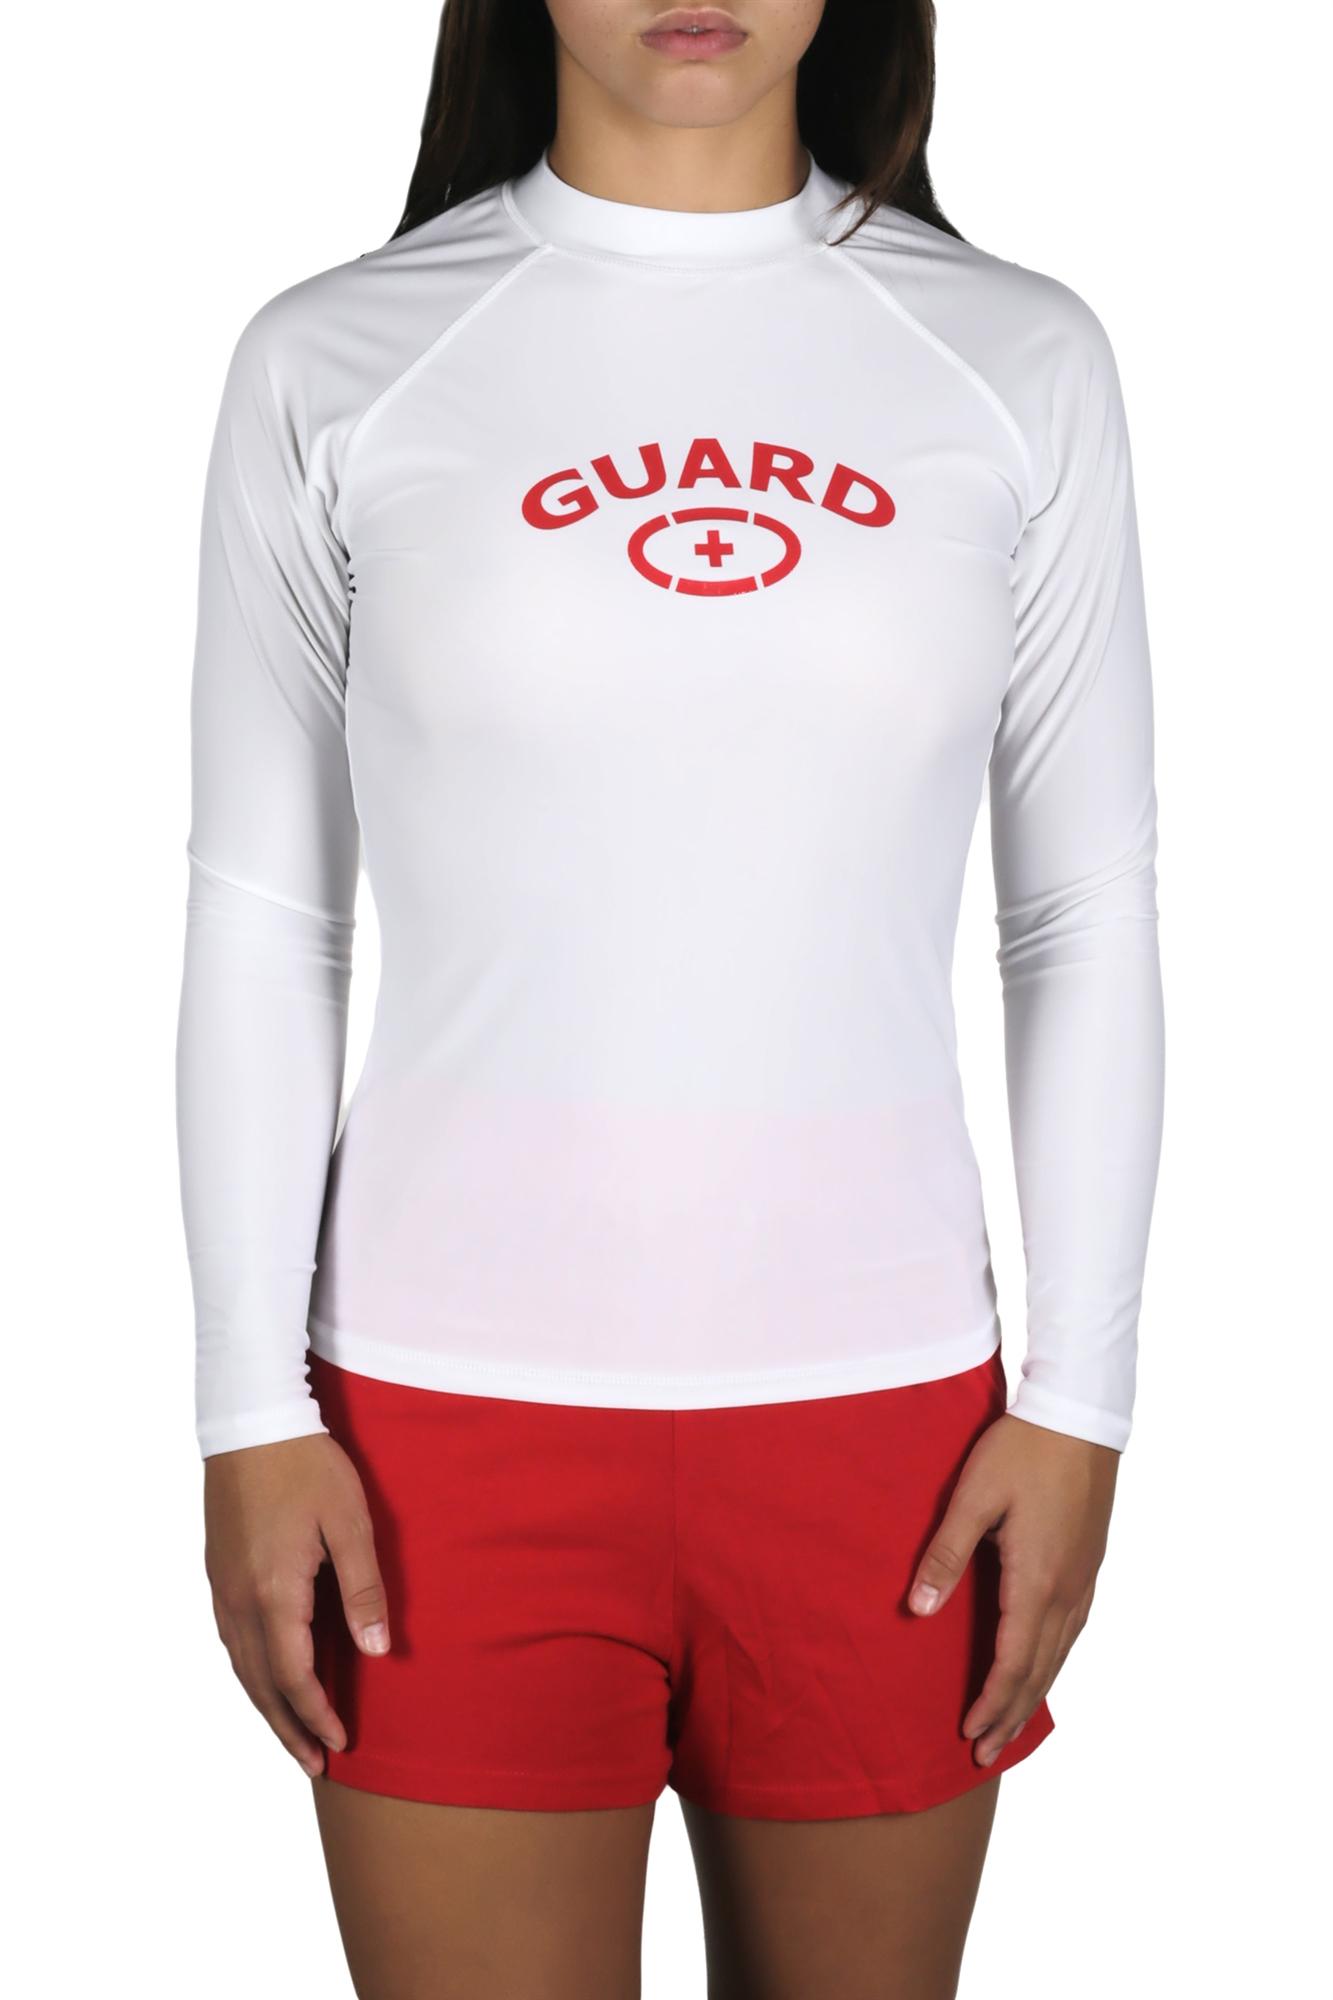 Adoretex Mens Guard Short Sleeve Rashguard UPF 50 Swim Shirt